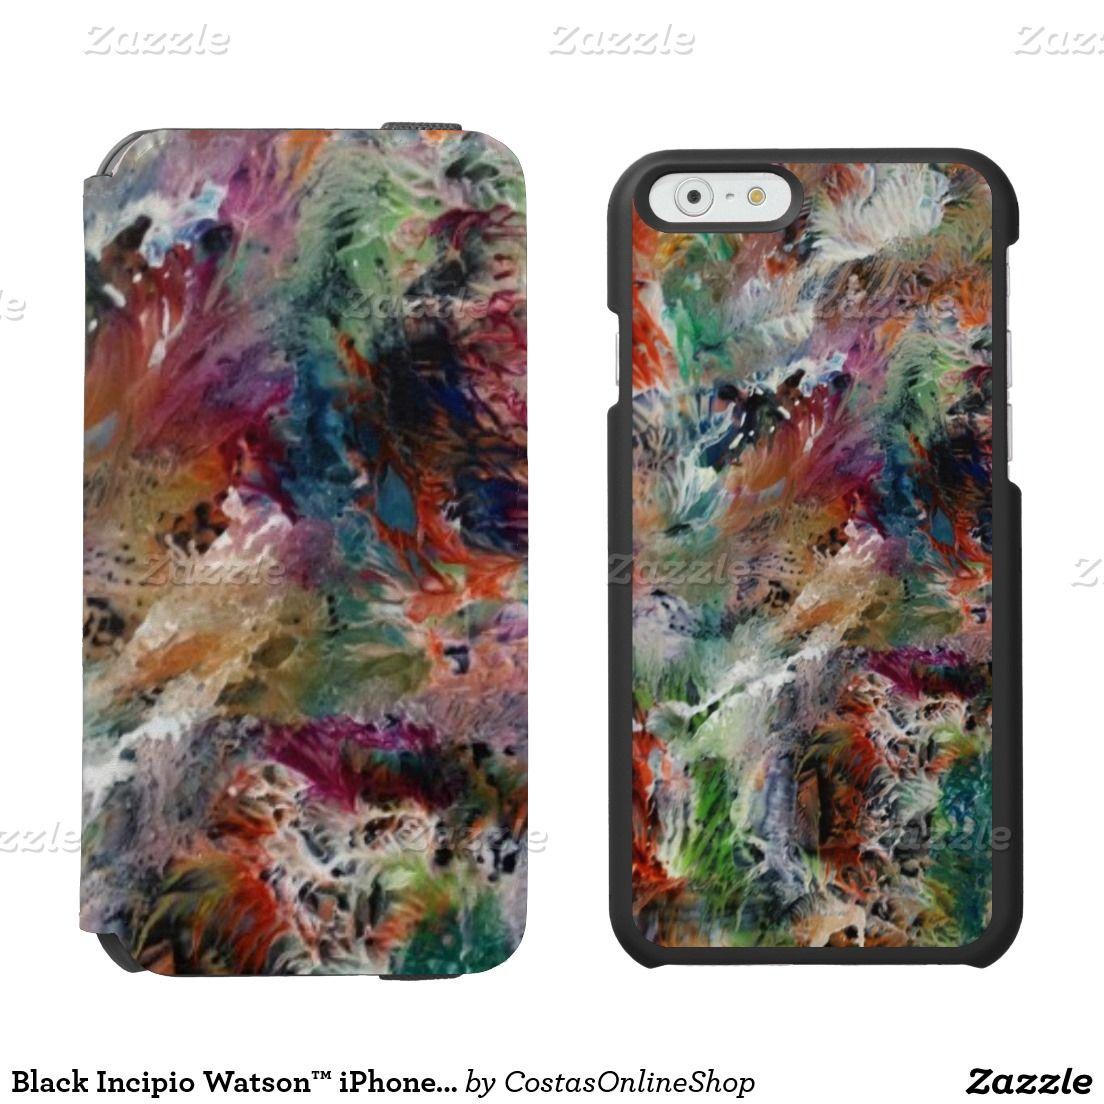 Black Incipio Watson™ iPhone 6 Wallet Case, Blank Incipio Watson™ iPhone 6 Wallet Case, http://www.zazzle.com/costasonlineshop*